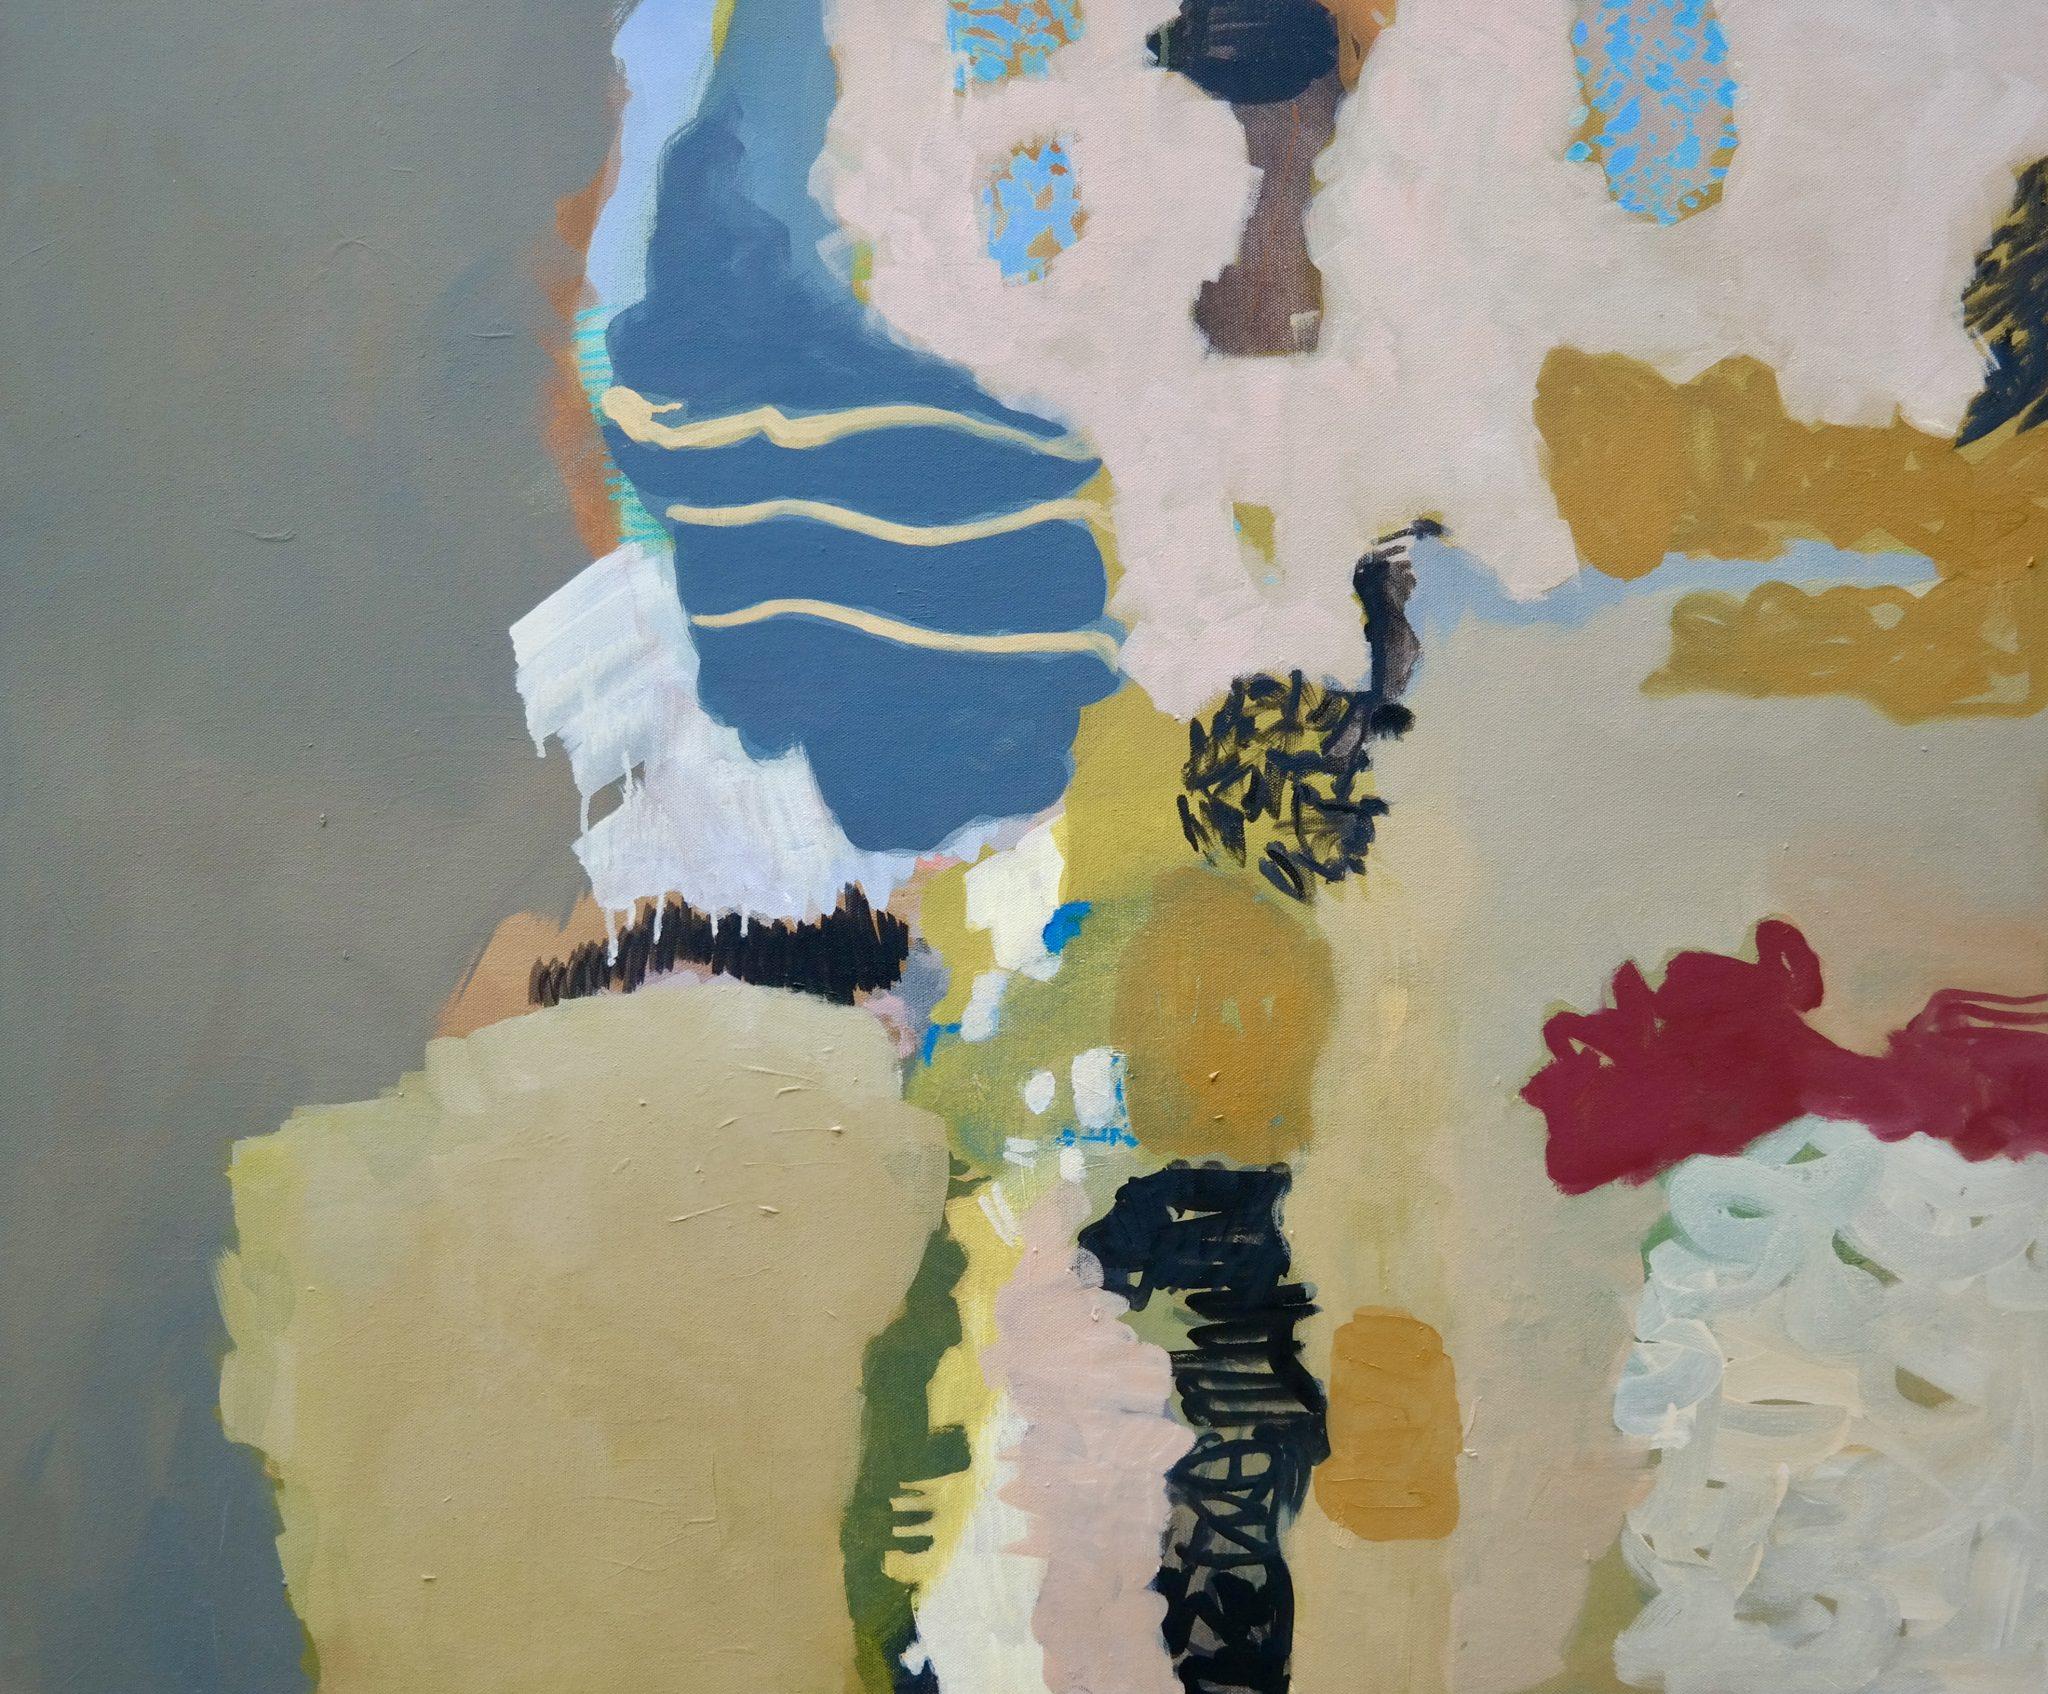 The Heart that Breaks Open, Megan Watson, exhibiting at Pie Factory Gallery 2020